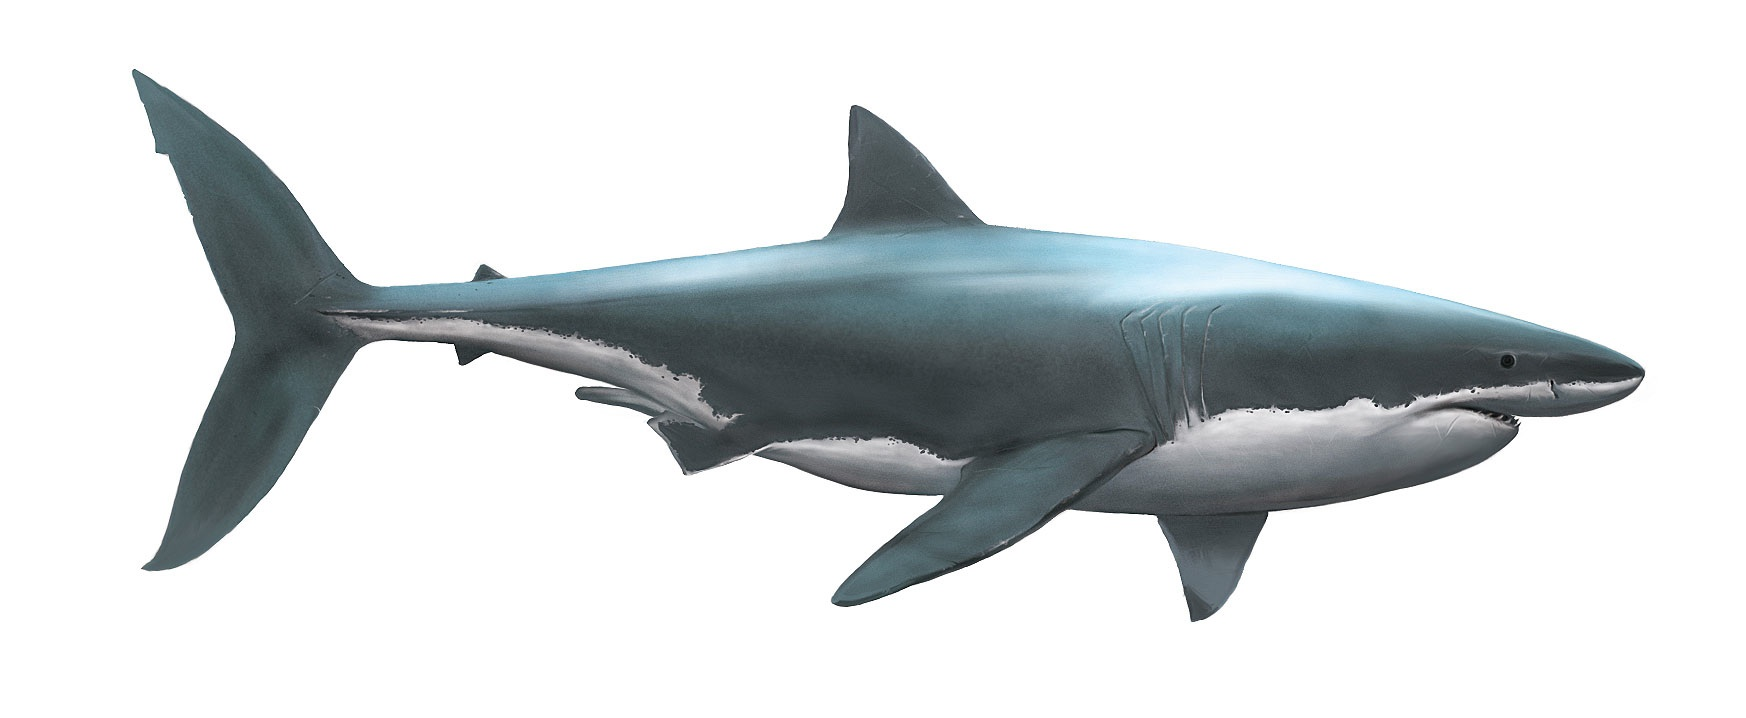 Tape 6 dessin de requin termin pictures to pin on pinterest - Requin en dessin ...